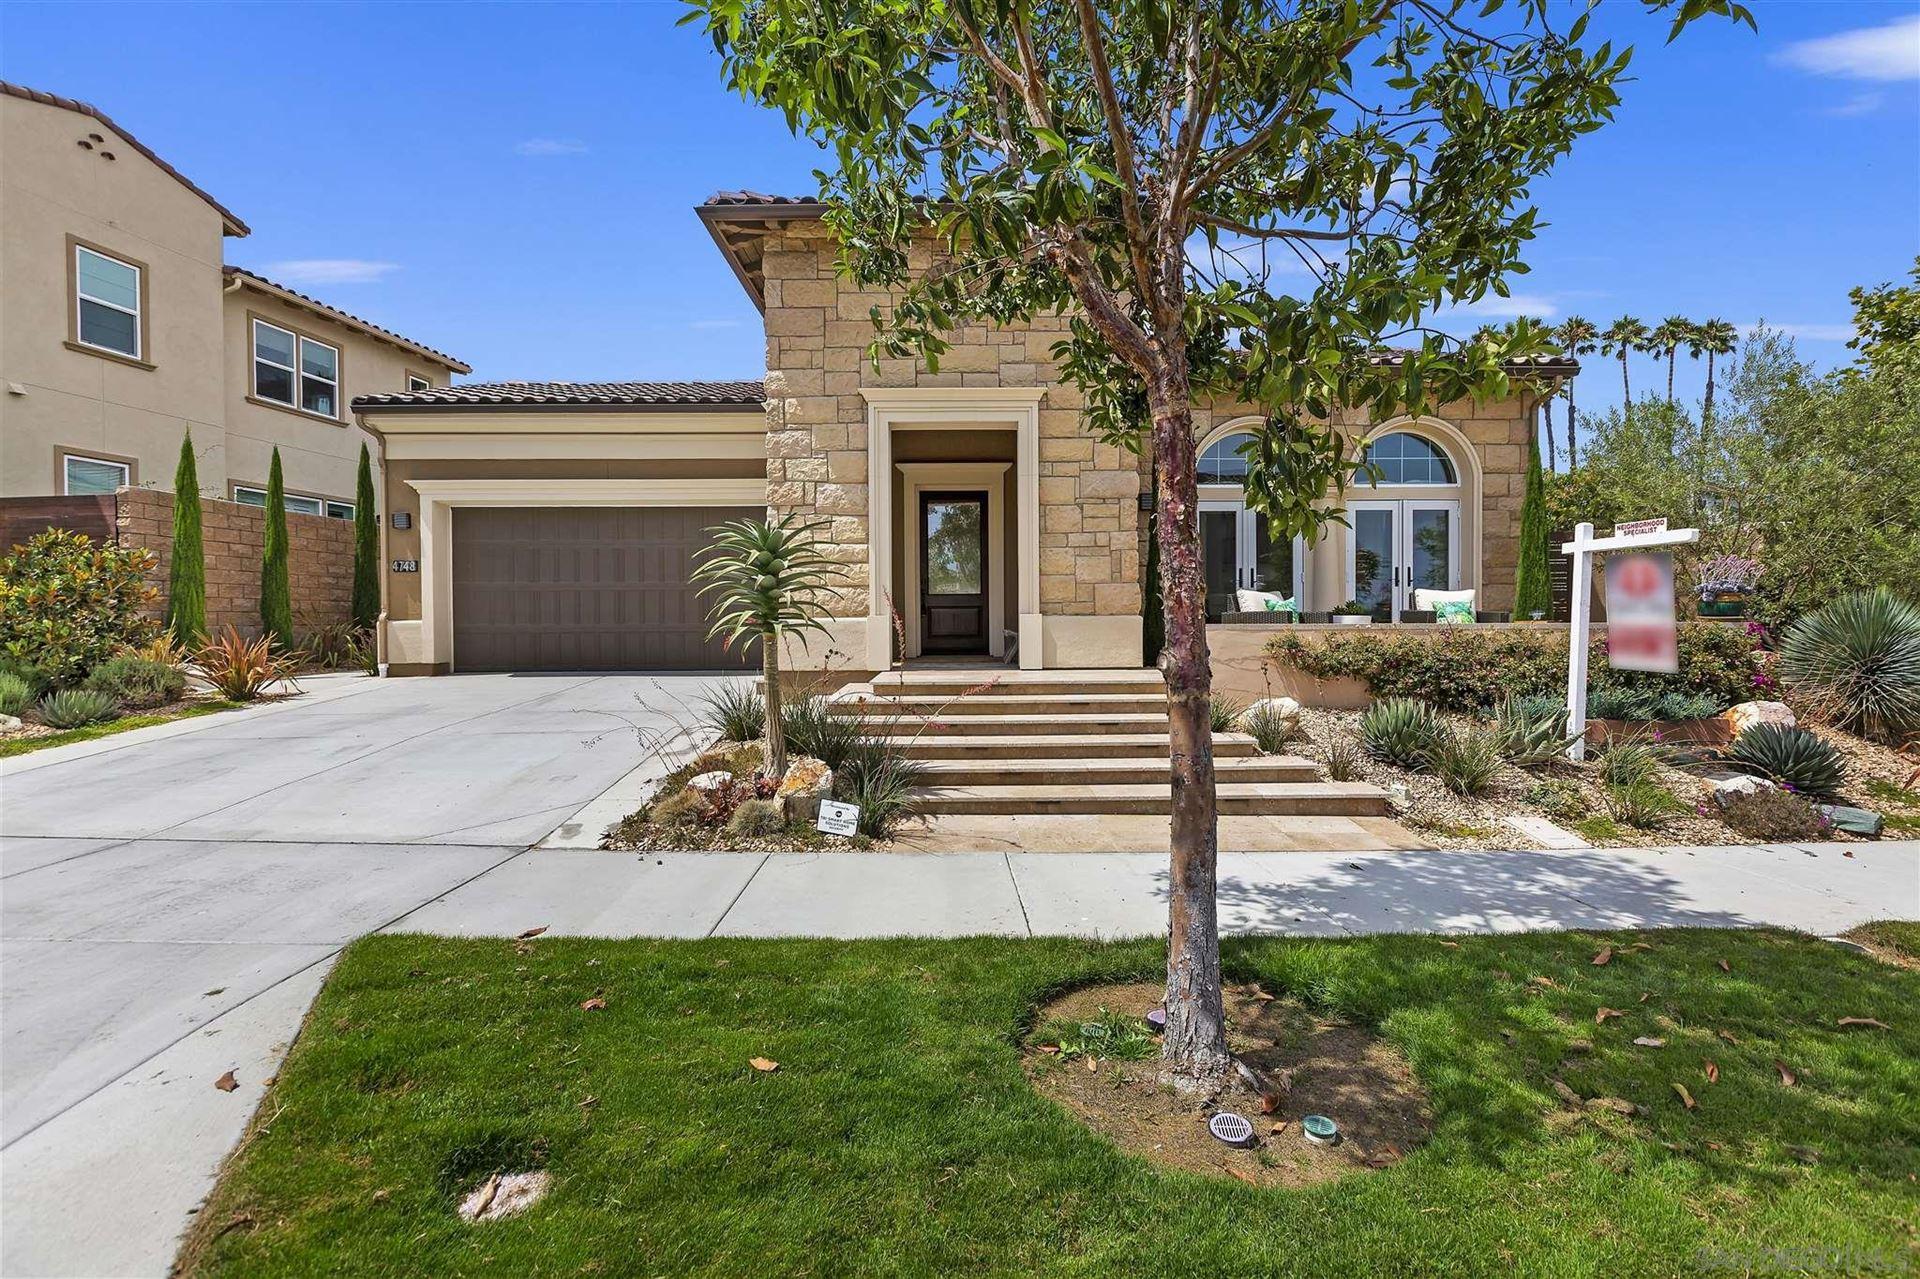 Photo of 4748 Borden Ct, Carlsbad, CA 92010 (MLS # 210021720)